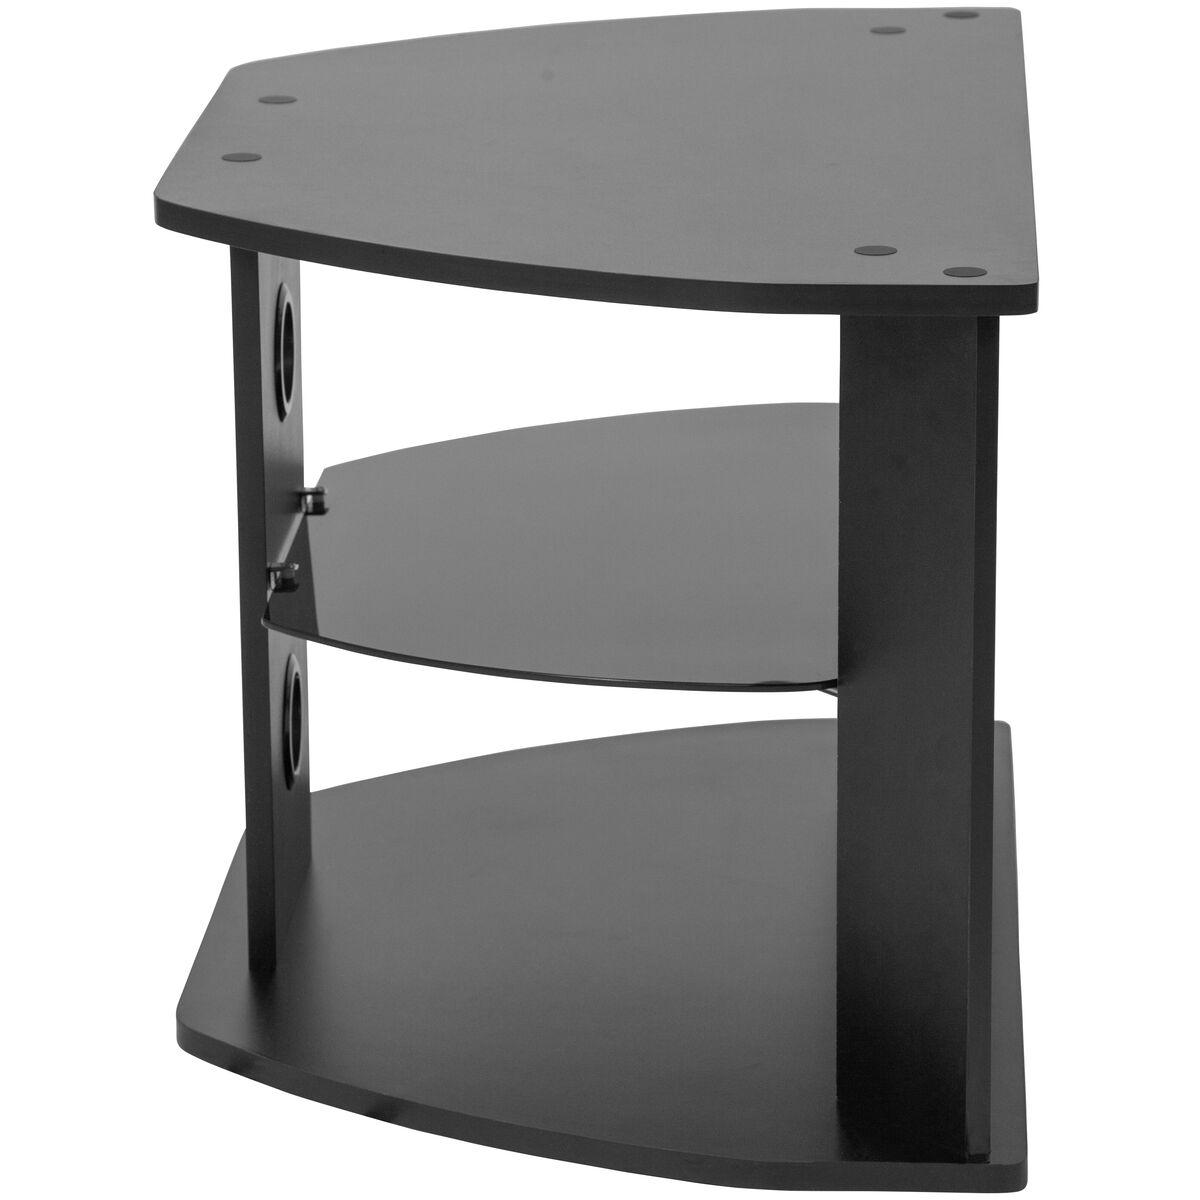 Black Tv Stand With Shelves Nan Rydal Gg Bizchaircom